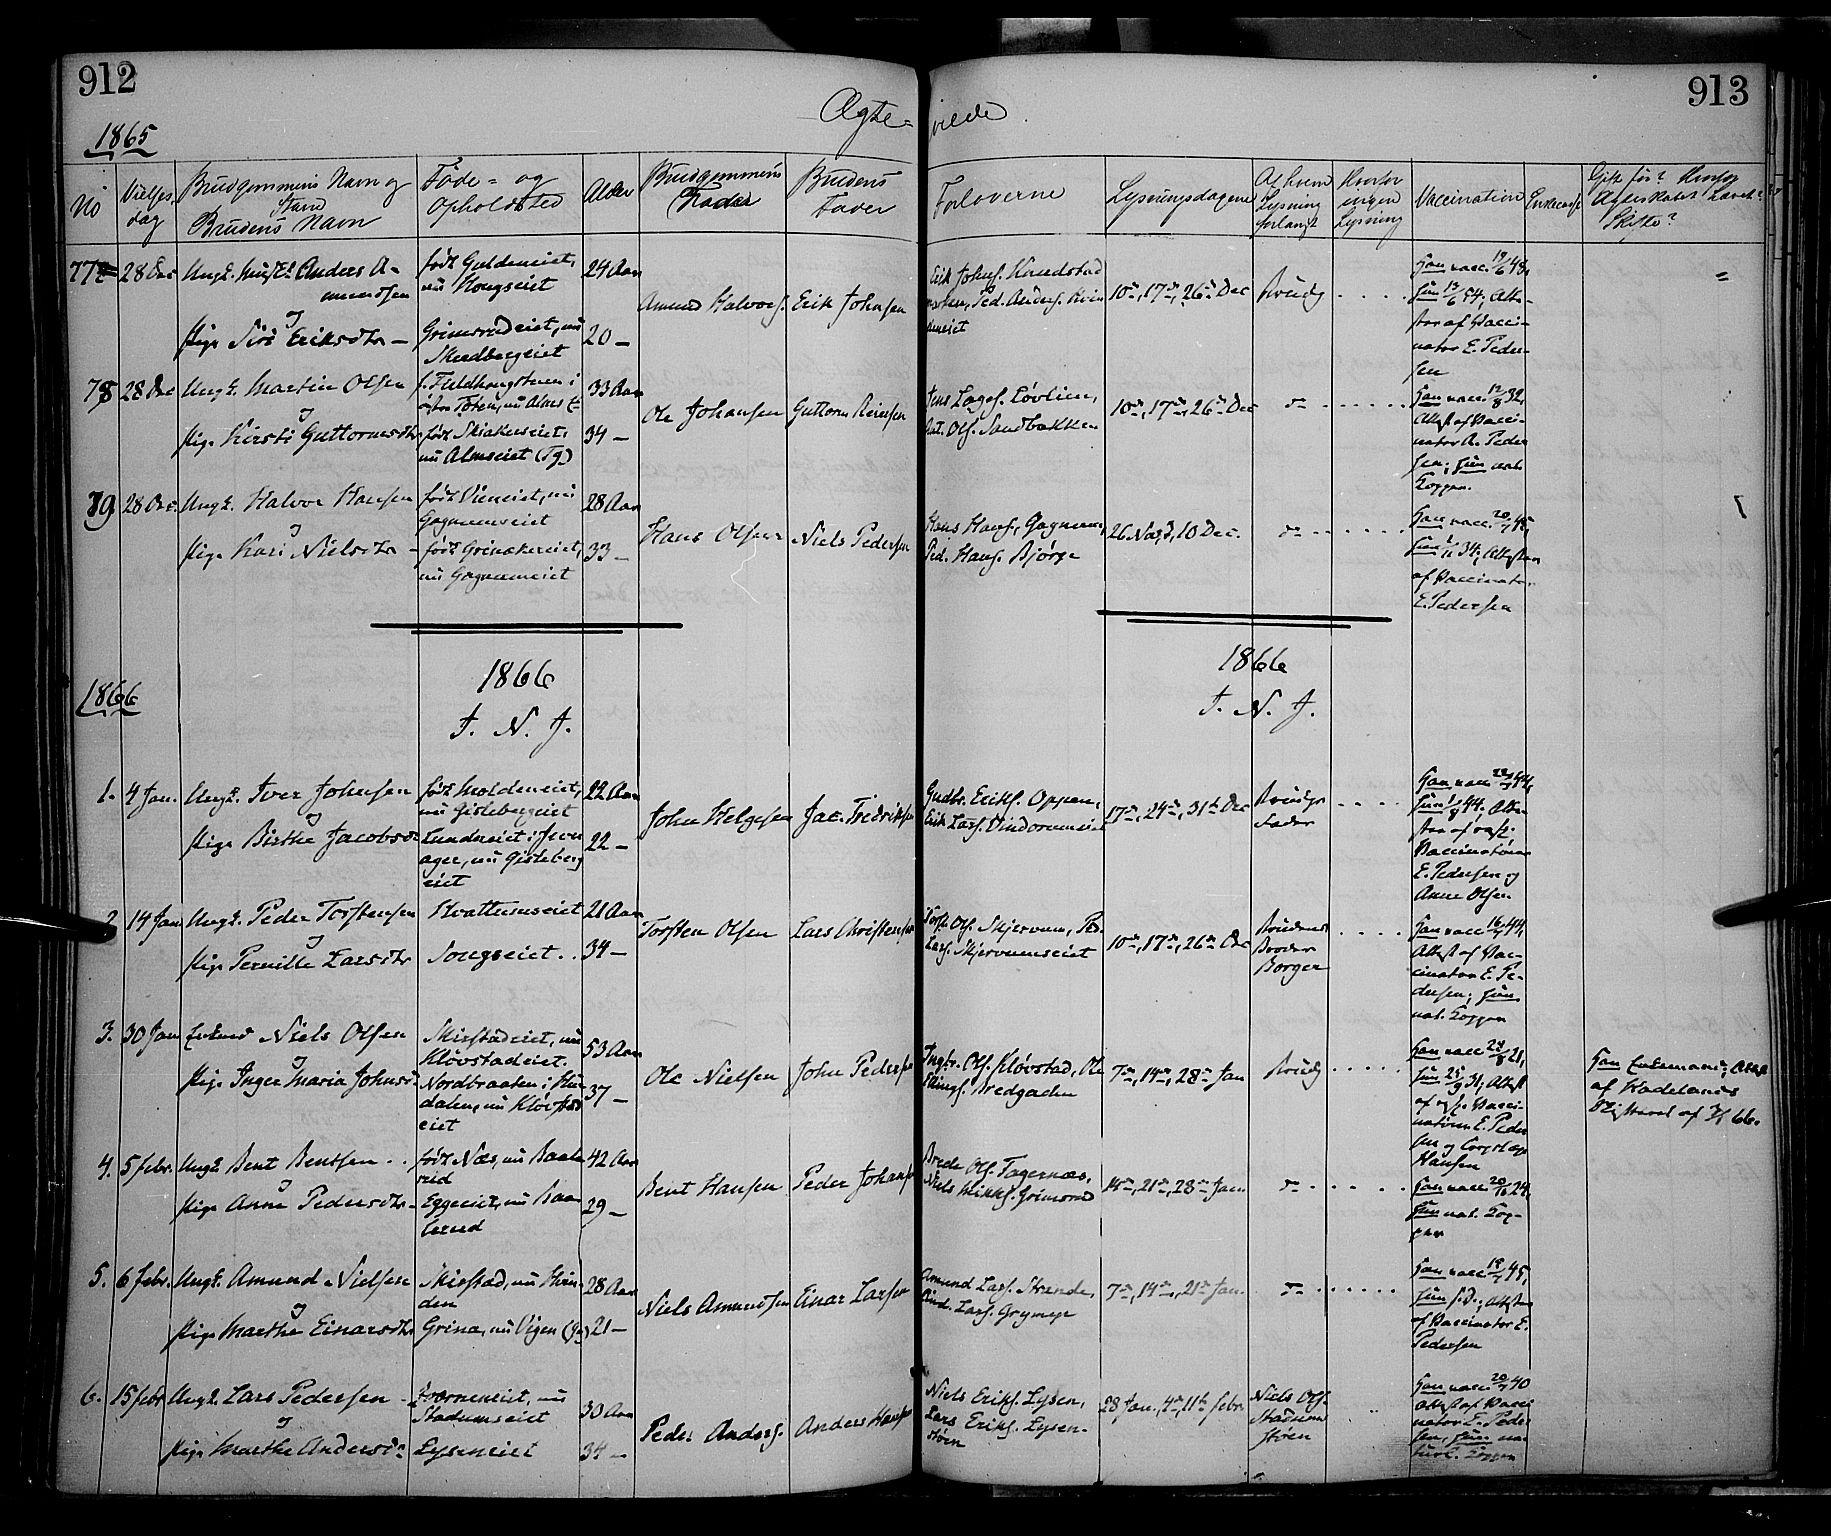 SAH, Gran prestekontor, Ministerialbok nr. 12, 1856-1874, s. 912-913